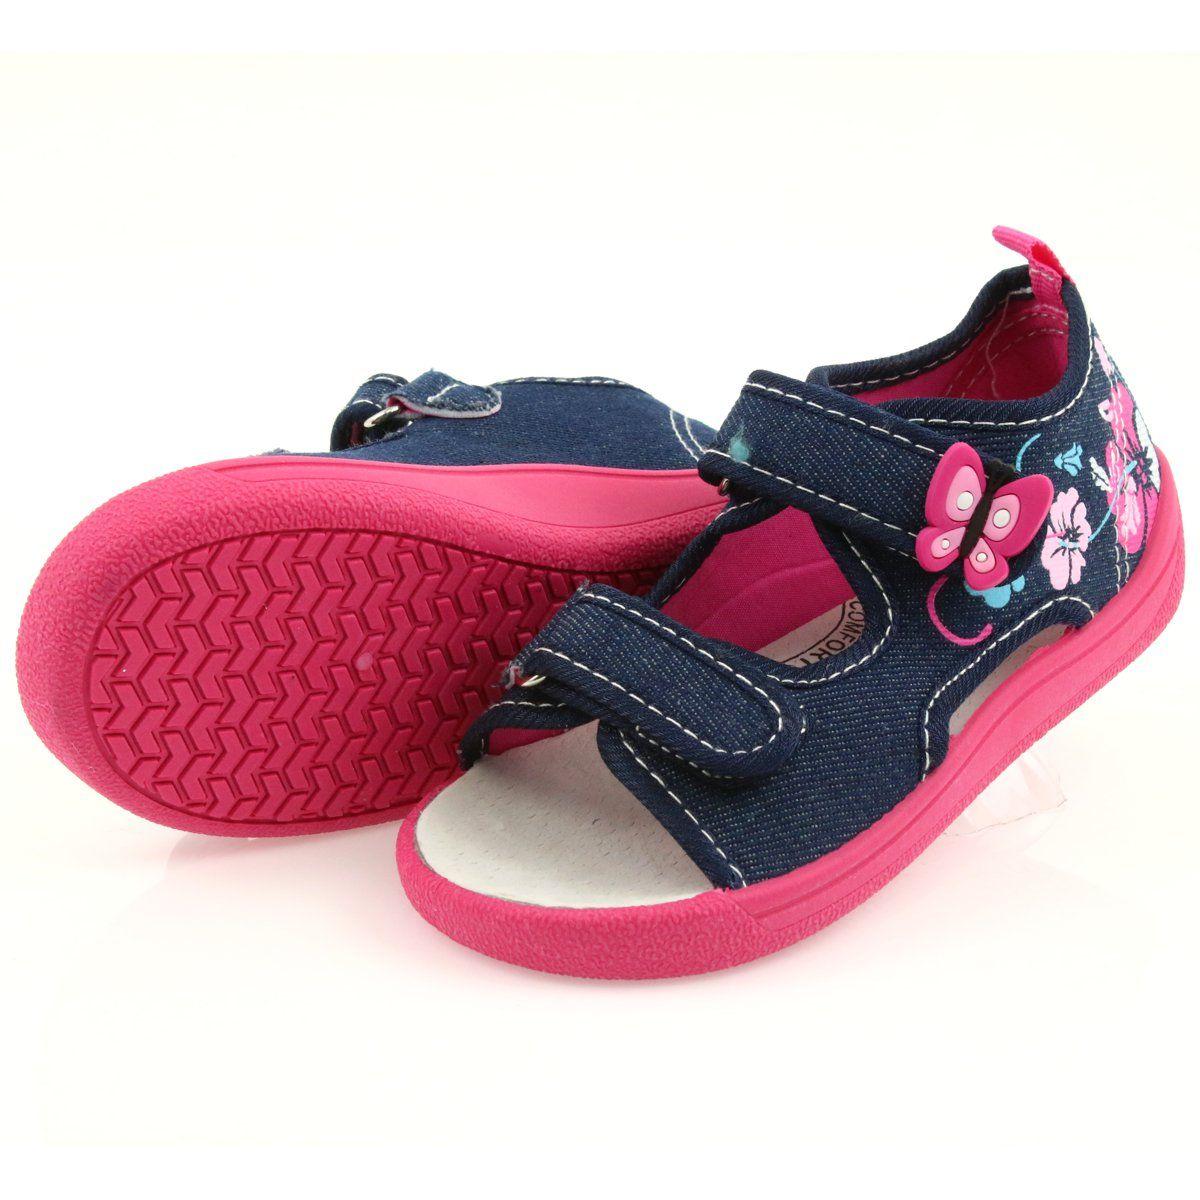 American Club Buty Dzieciece Kapcie Sandalki American Wkladka Skorzana 37 19 Childrens Shoes Baby Shoes Shoes World